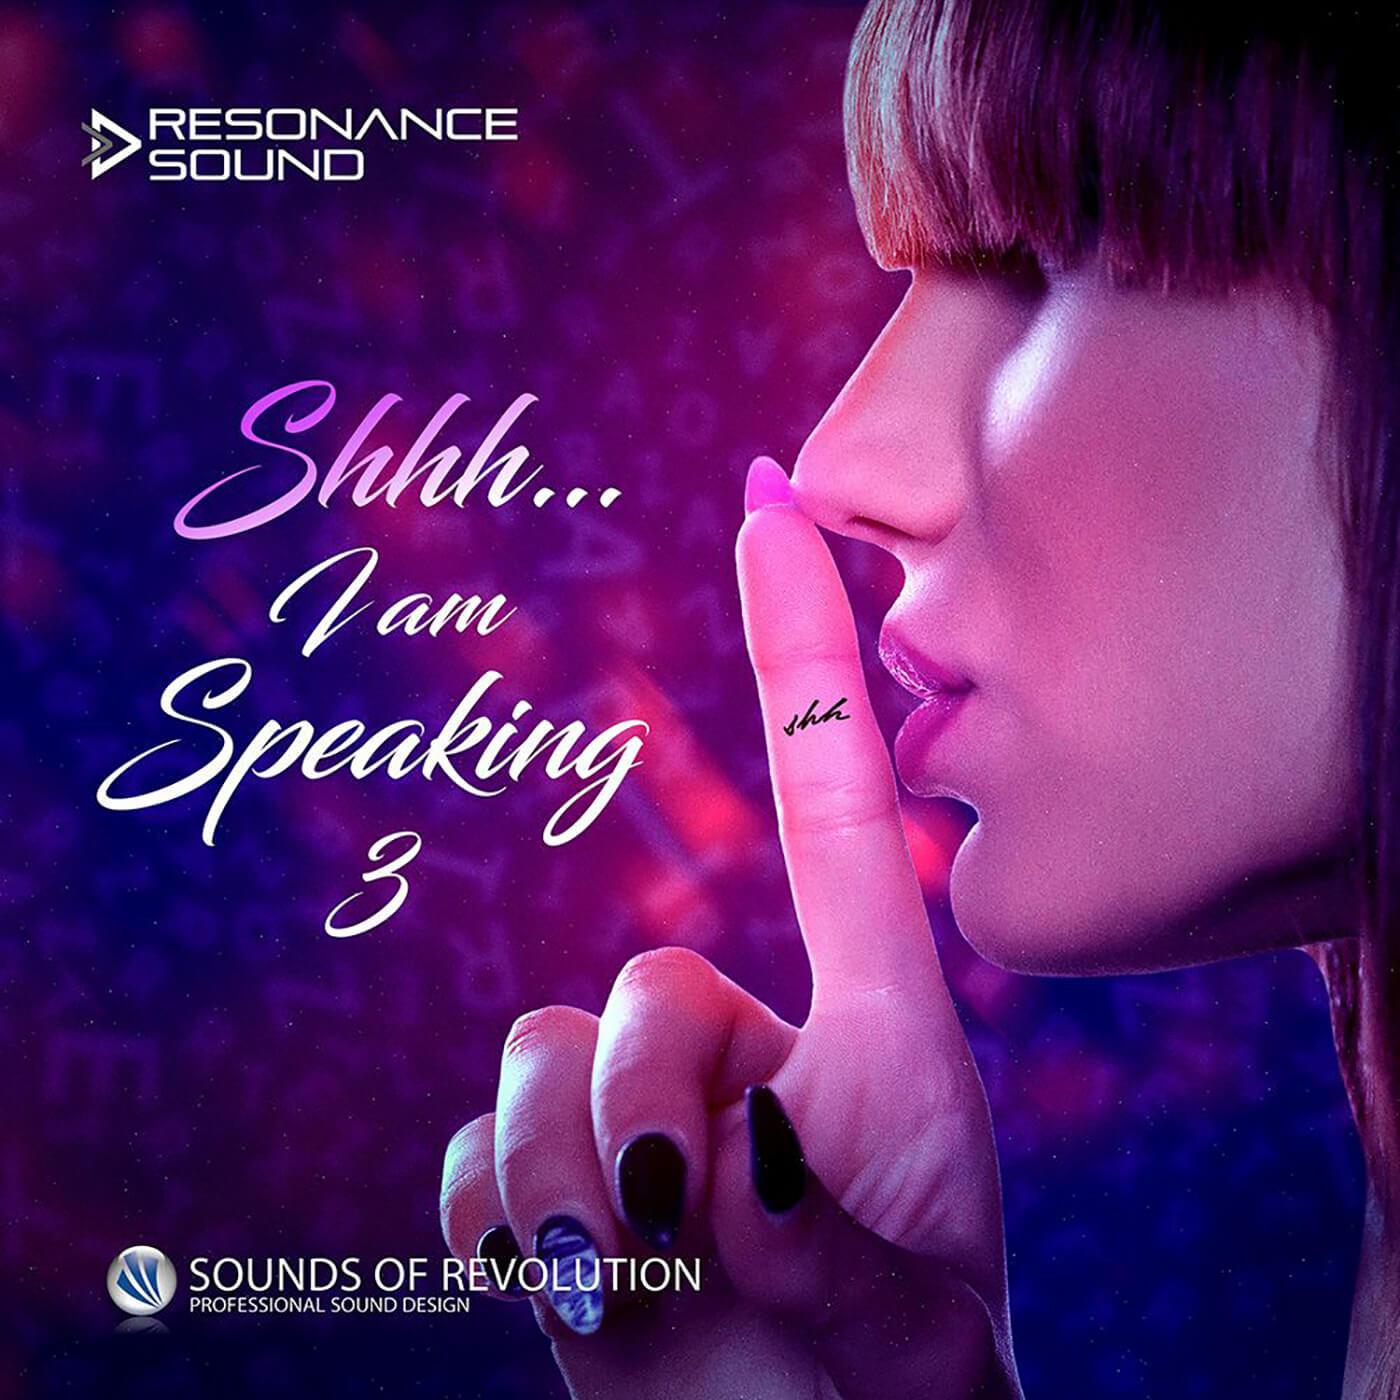 Resonance Sound - SOR Shhh I Am Speaking 3